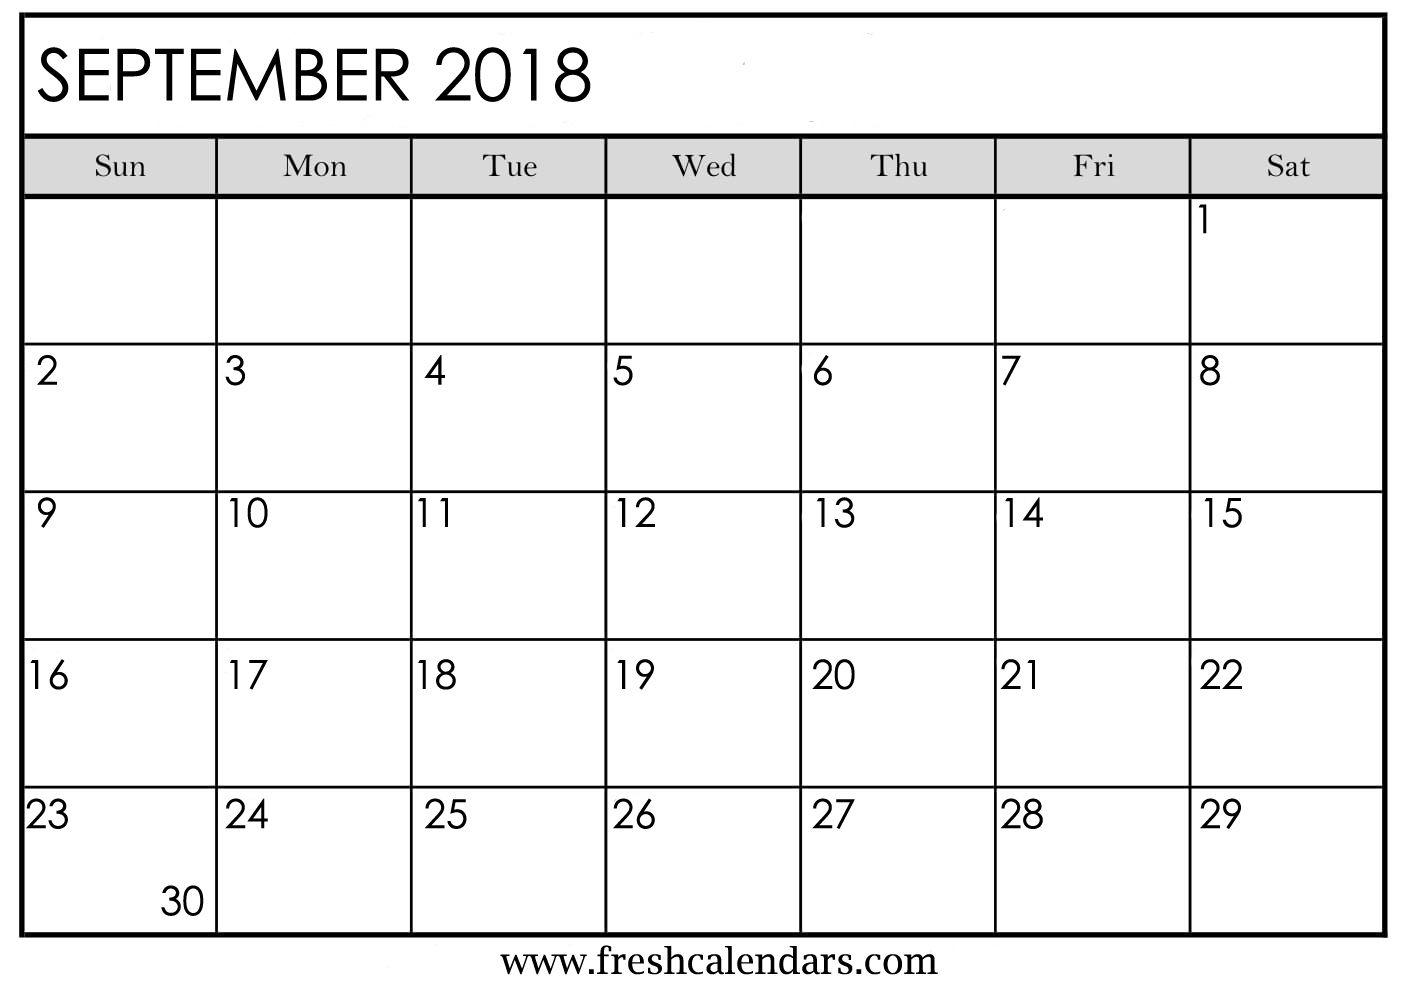 September 2018 Calendar Printable - Fresh Calendars throughout Microsoft November Calendar Templates